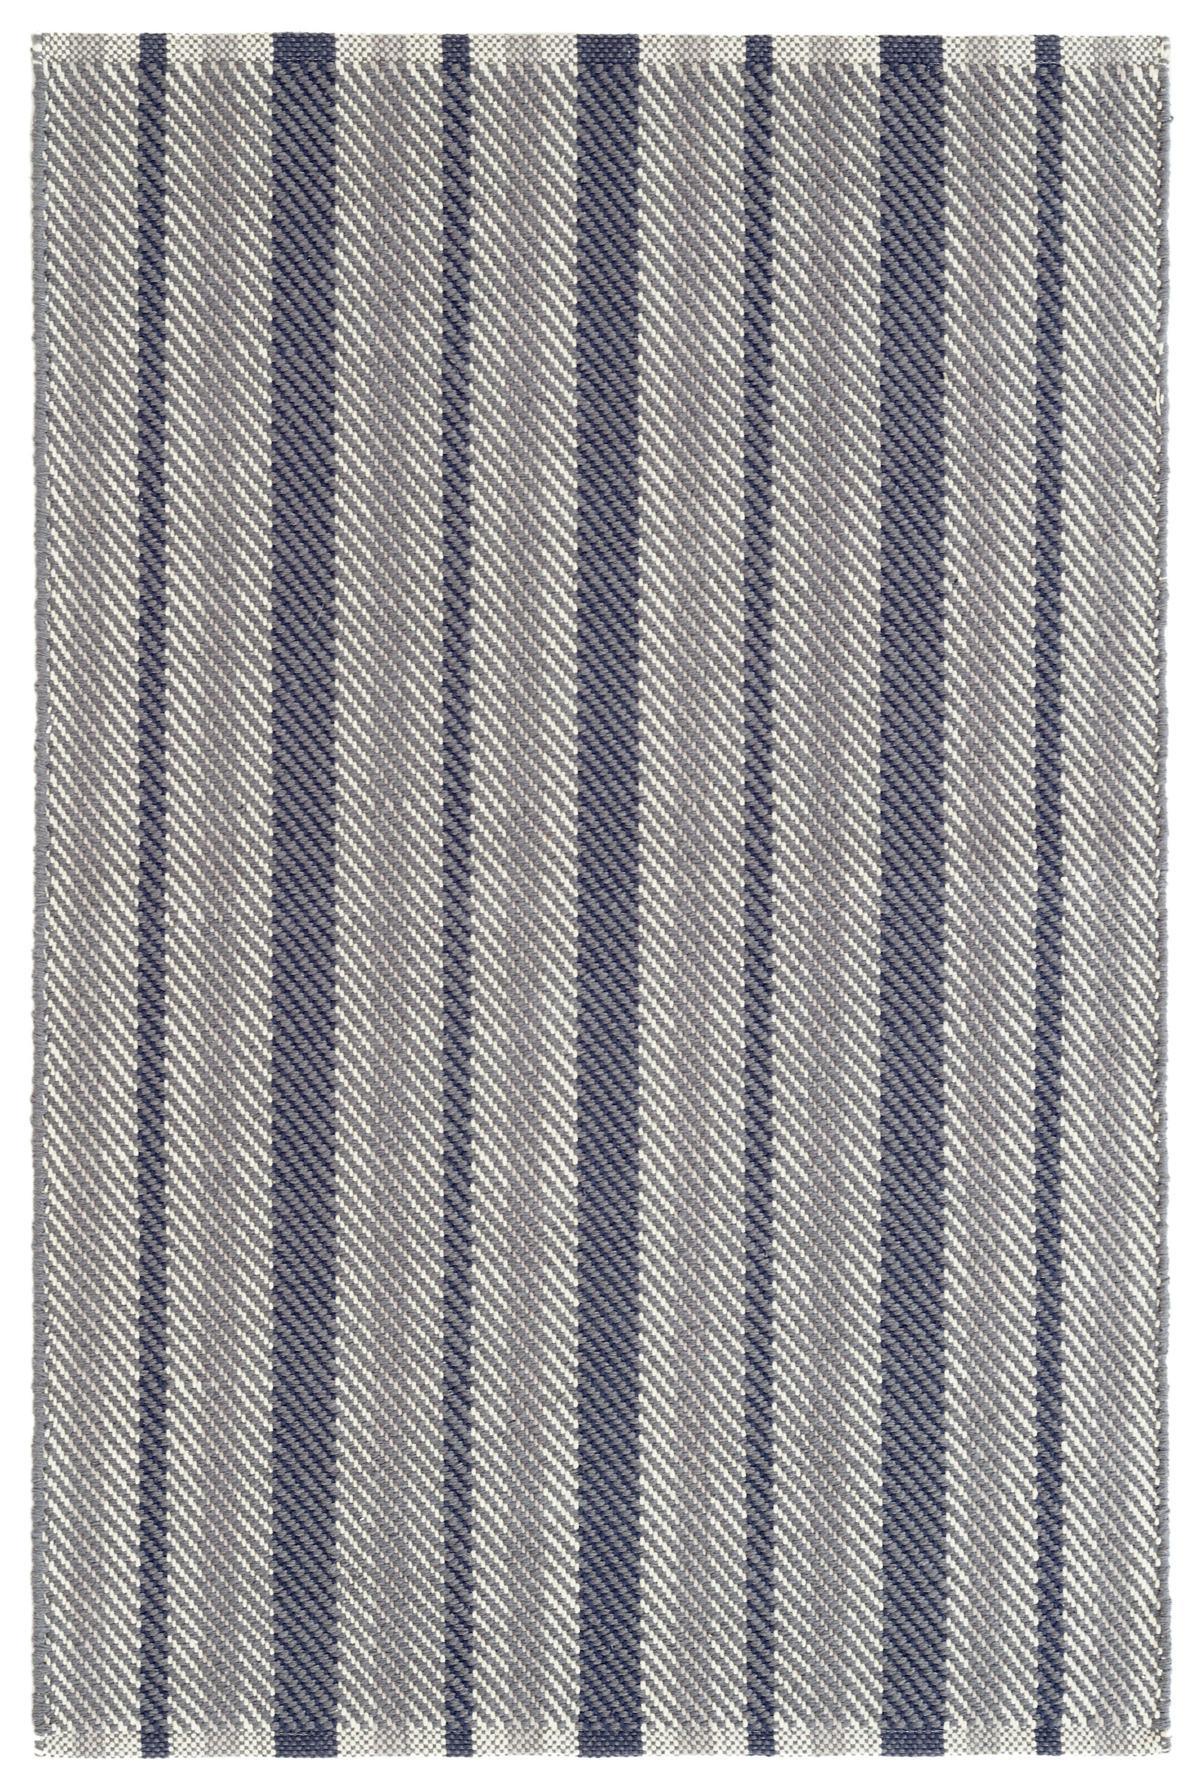 Herringbone Stripe Navy Woven Cotton